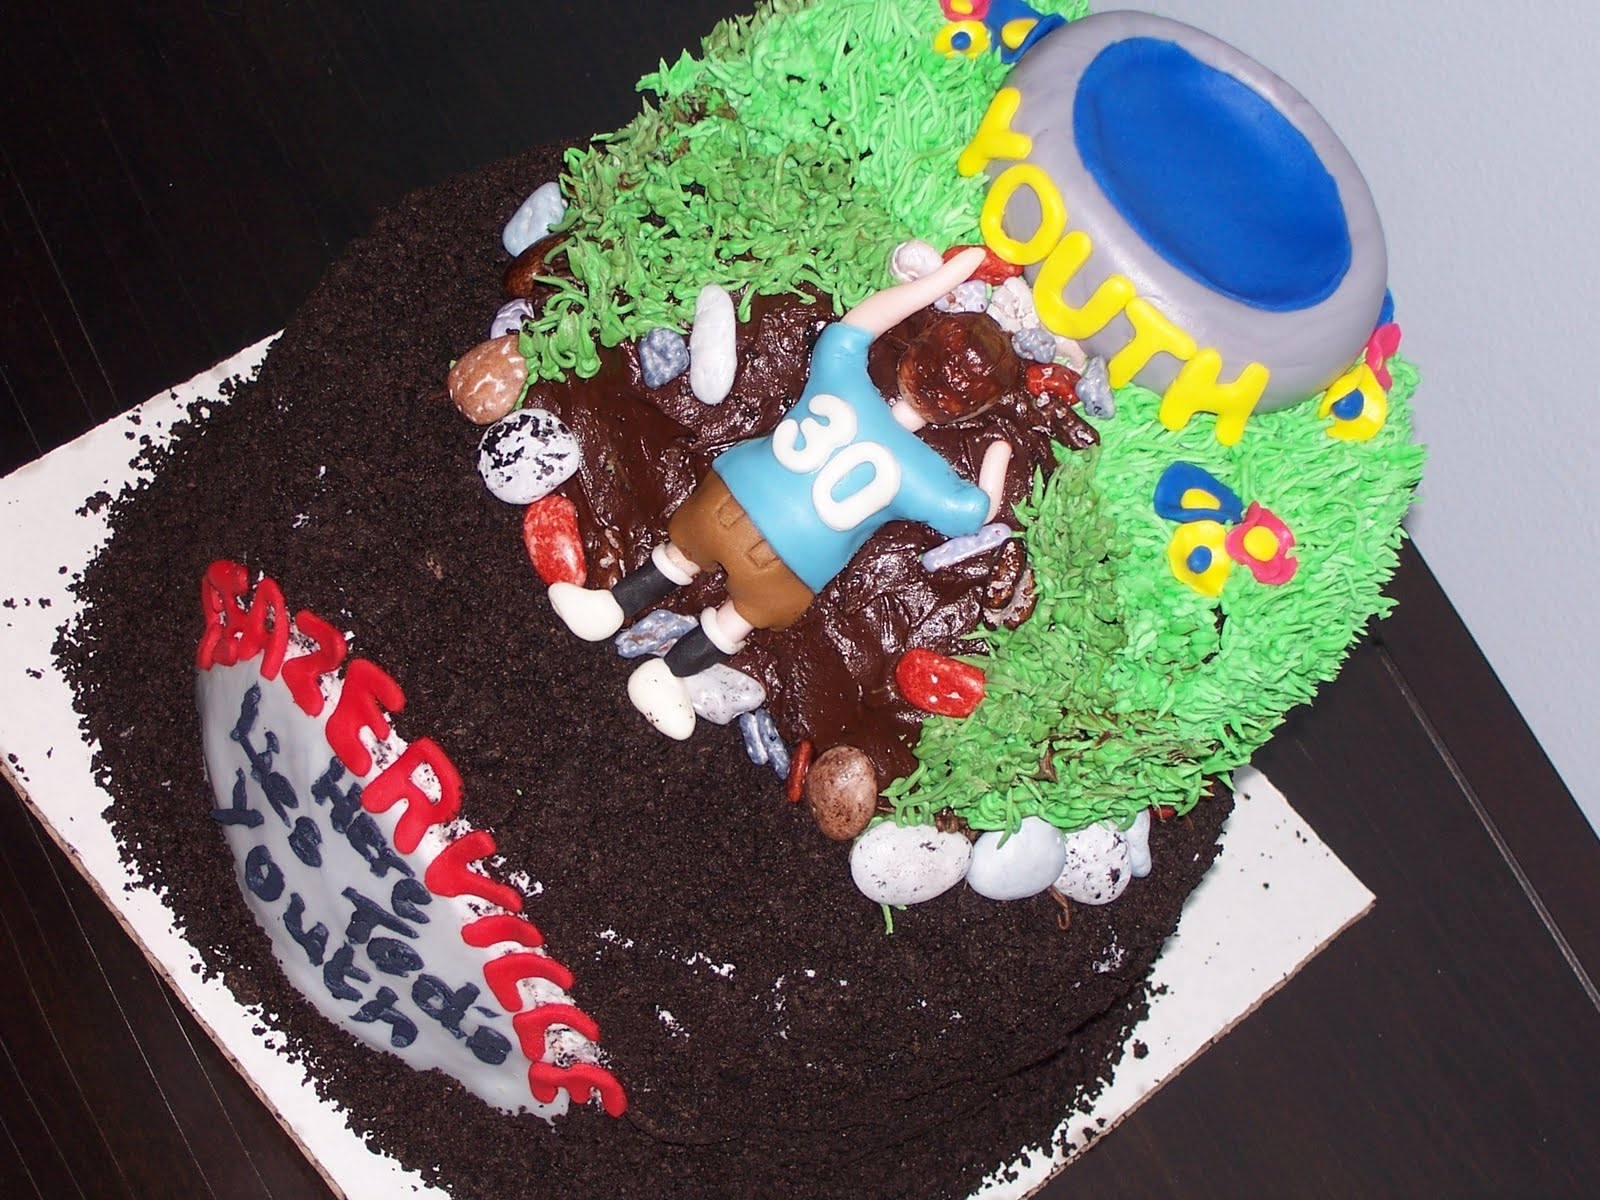 Sweet baby mason james humorous 30th birthday cake for 30th birthday cake decoration